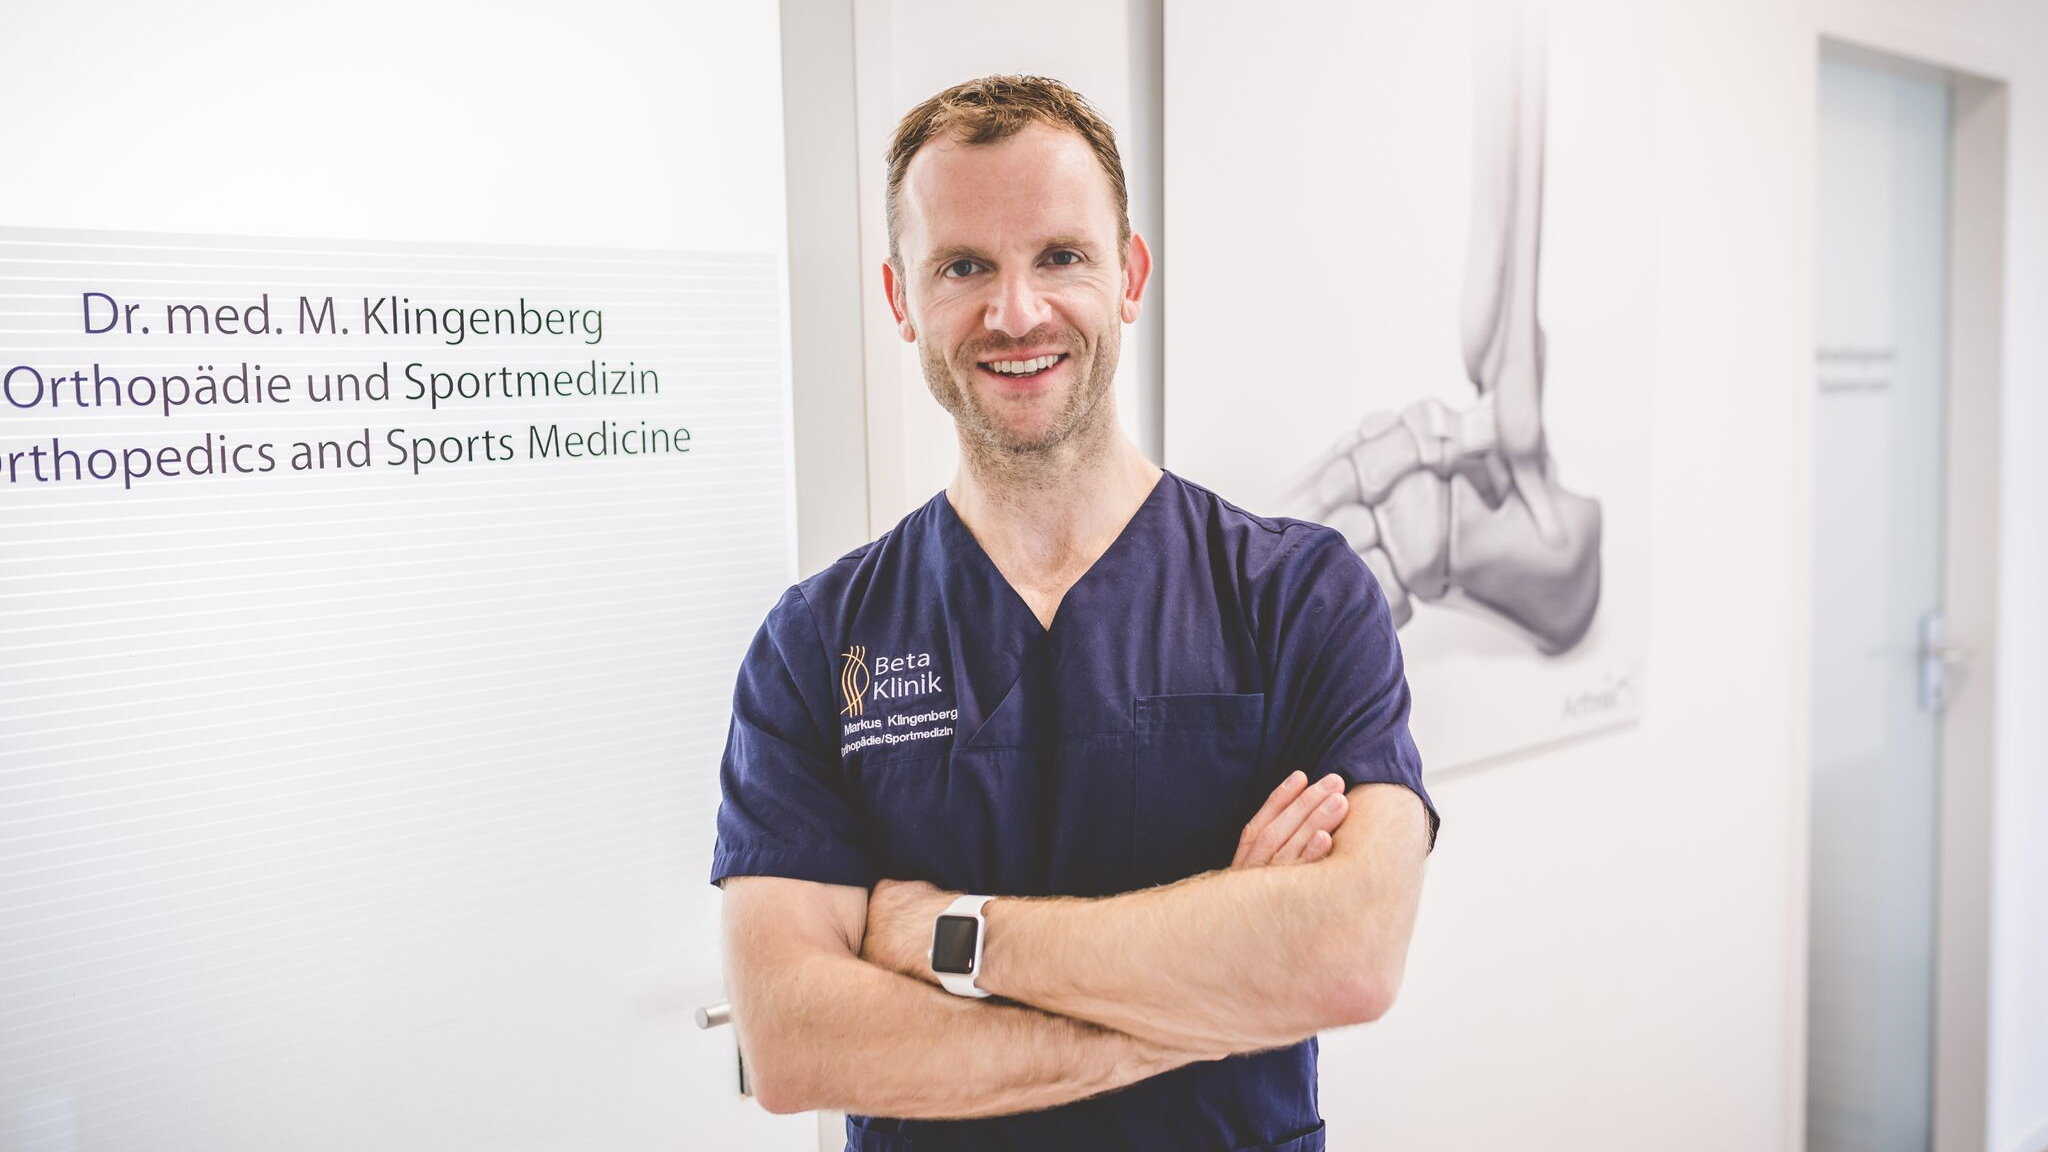 (Deutsch) Dr. Markus Klingenberg Sportmedizin Orthopädie Bonn